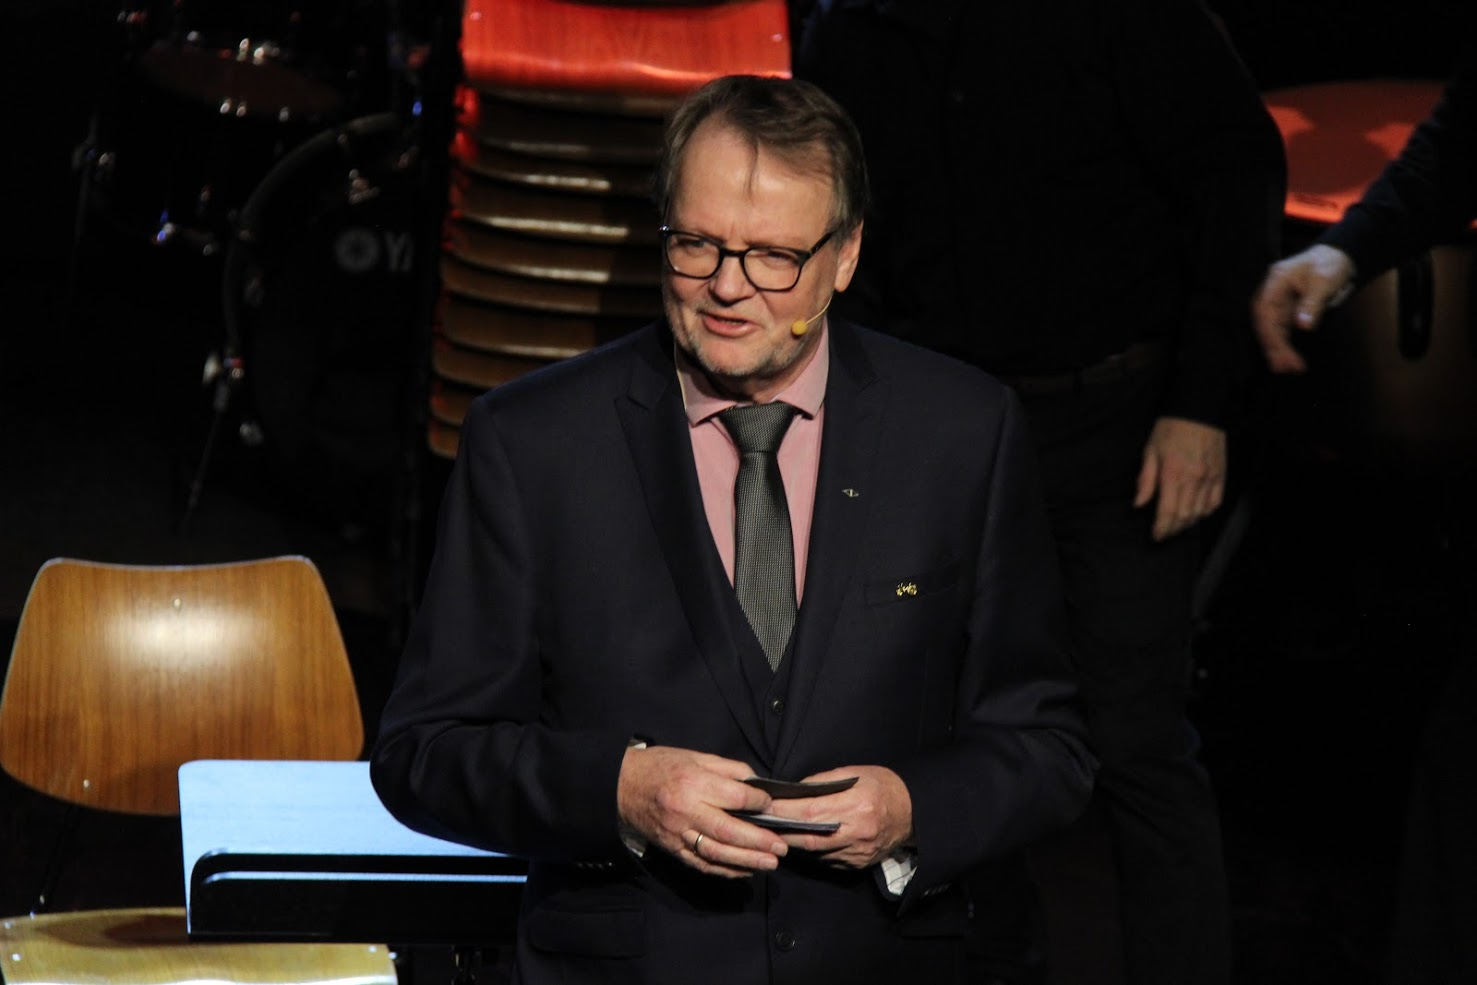 Ove Jørgen Snuruås